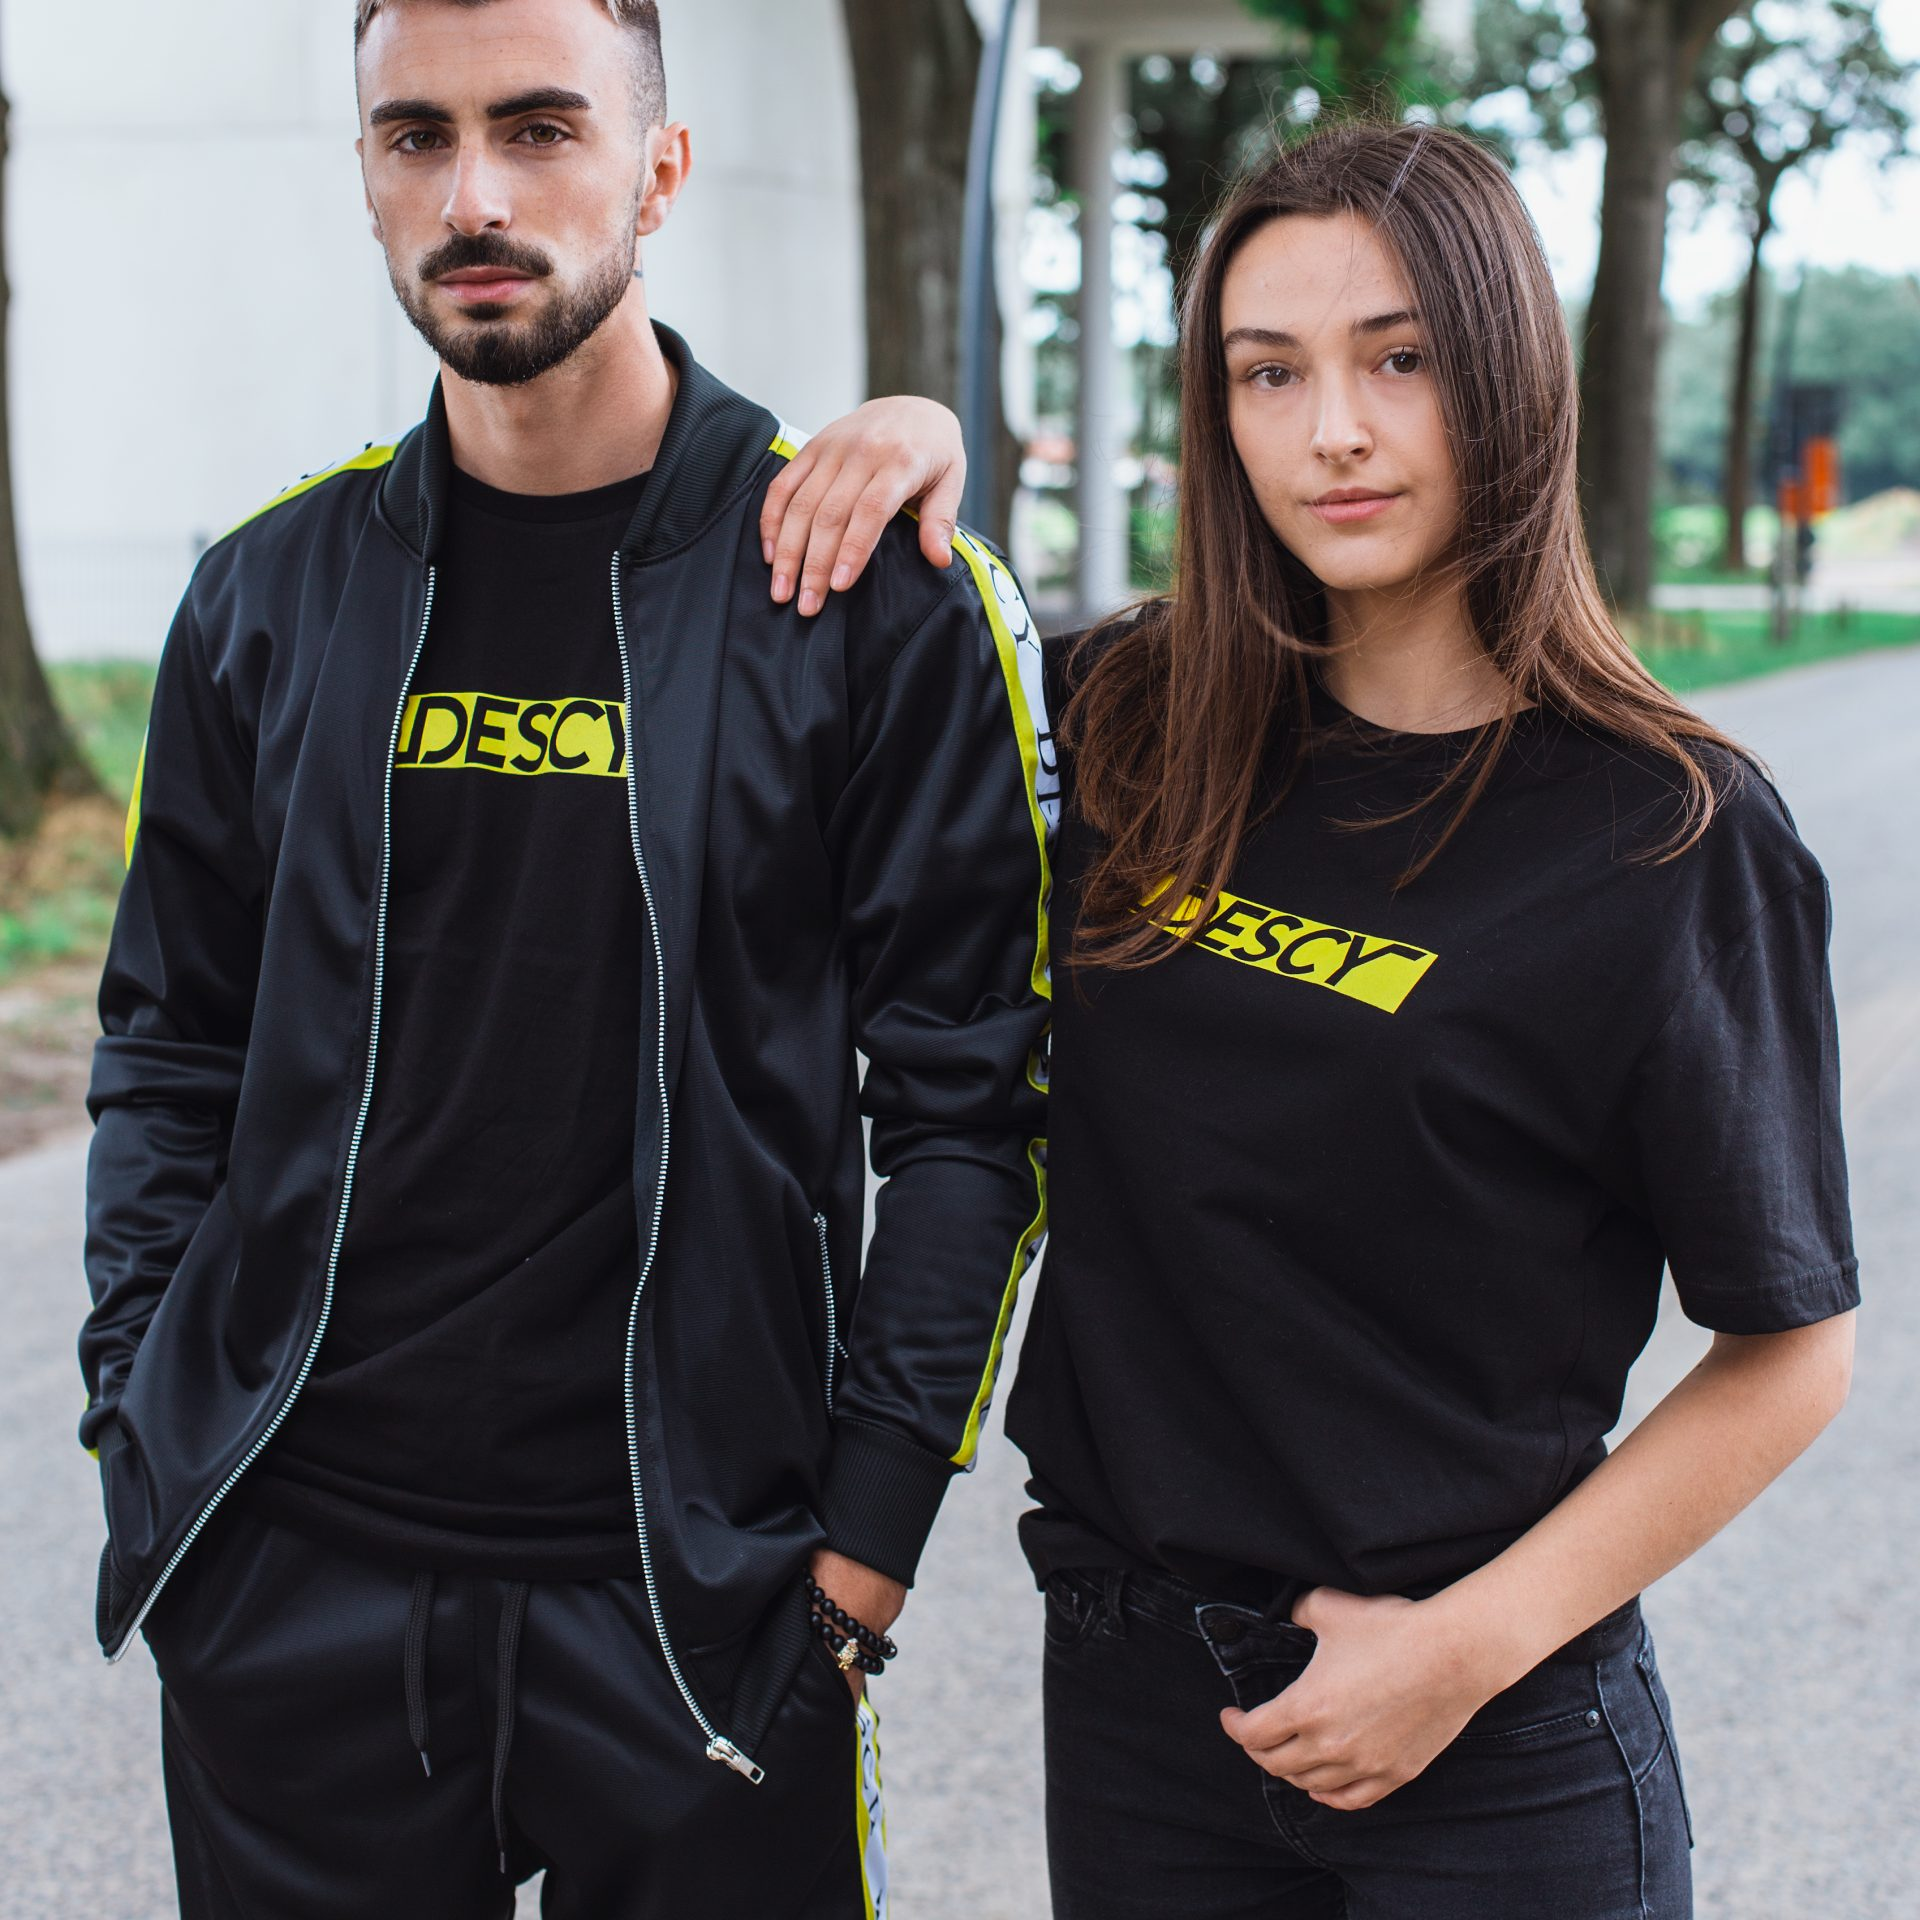 DESCY Yellow Box Logo Schwarz T-shirt Unisex